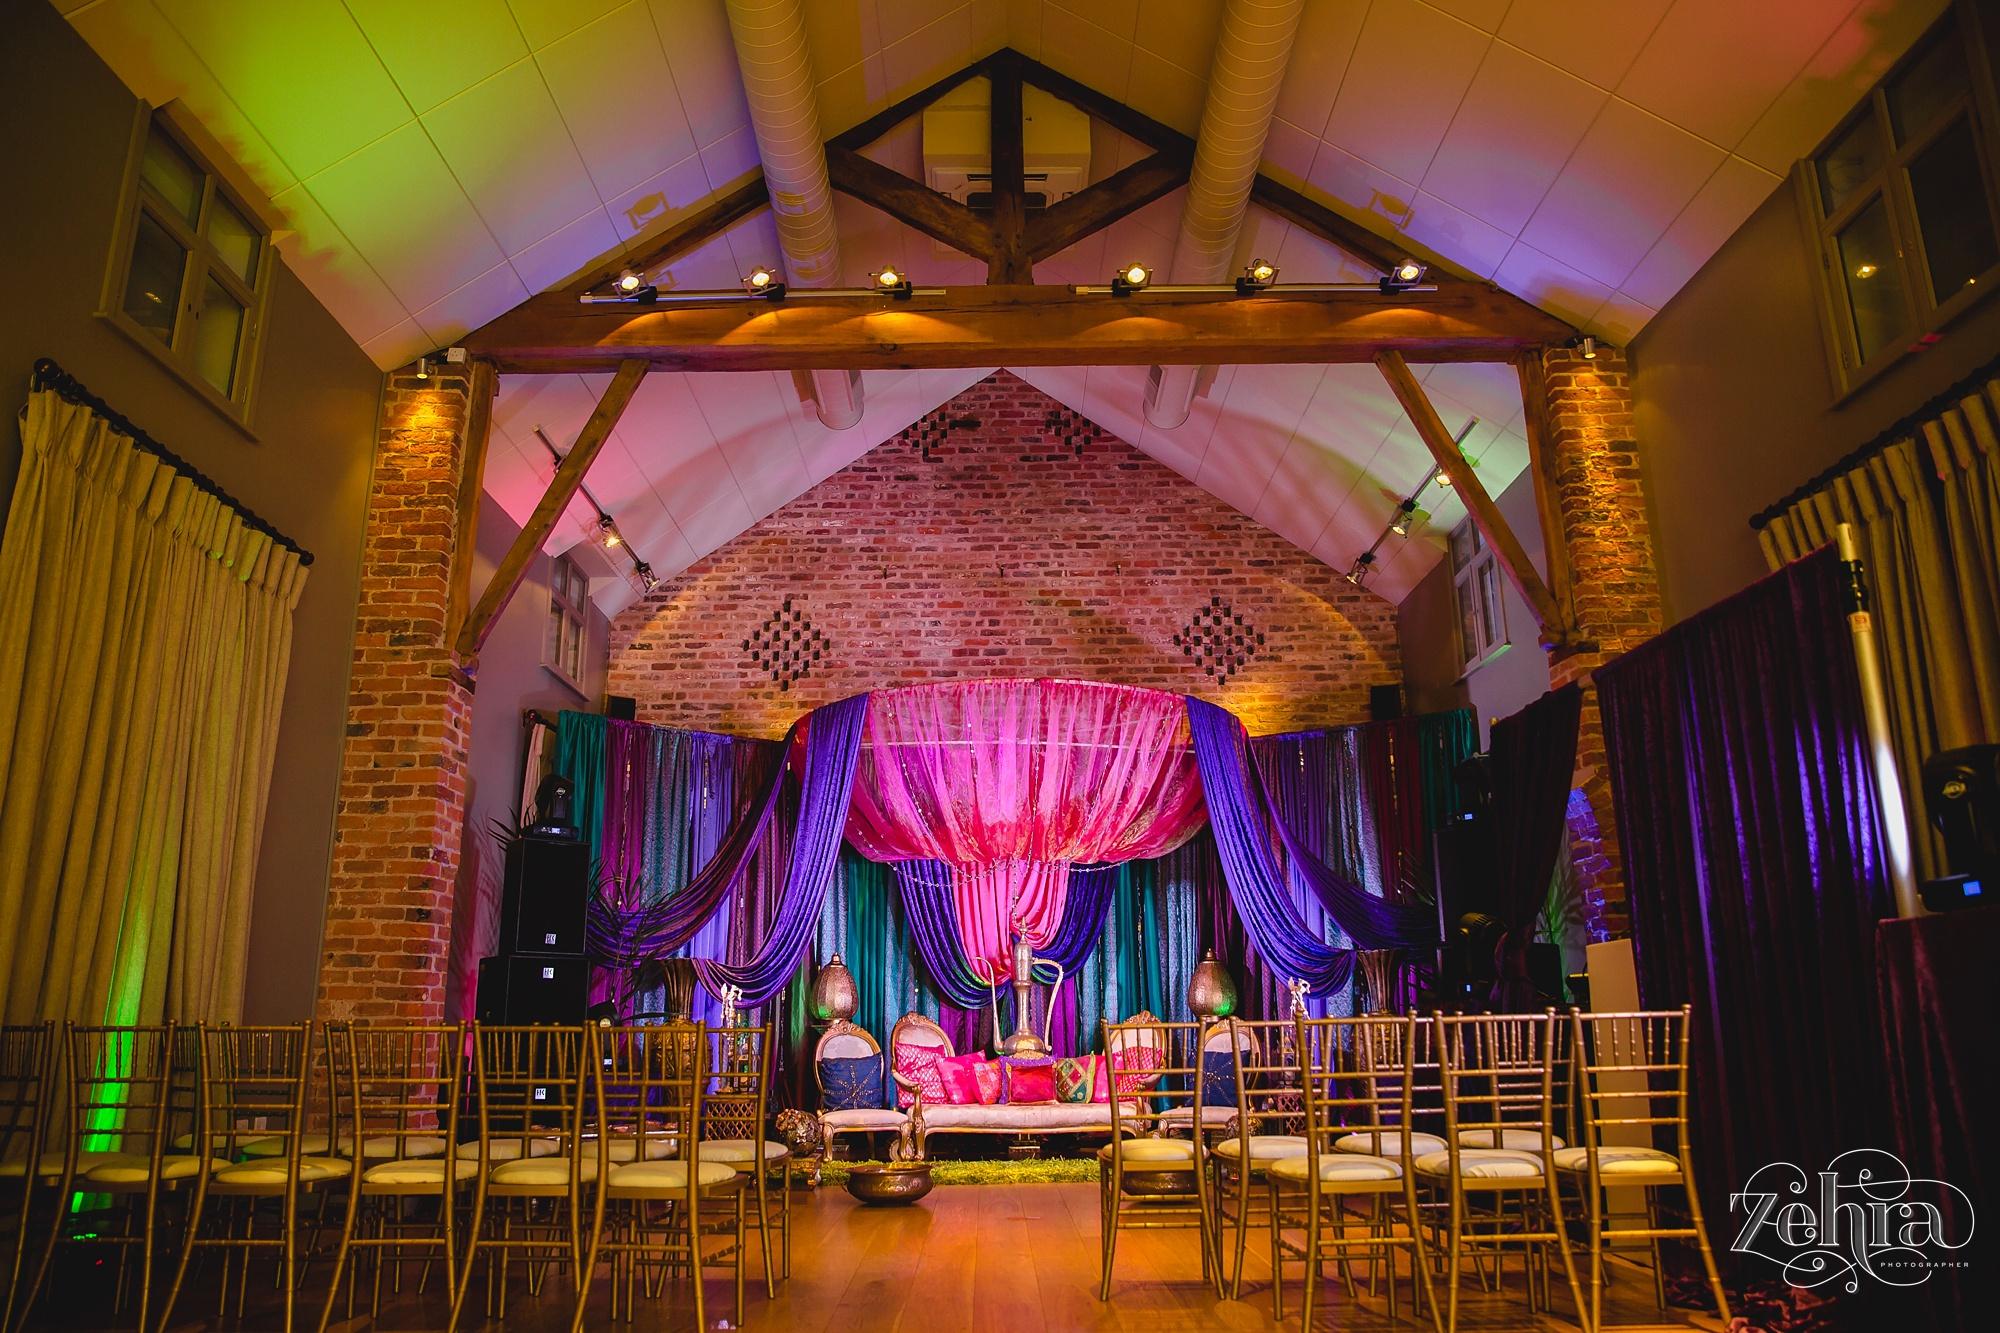 zehra wedding photographer arley hall cheshire022.jpg